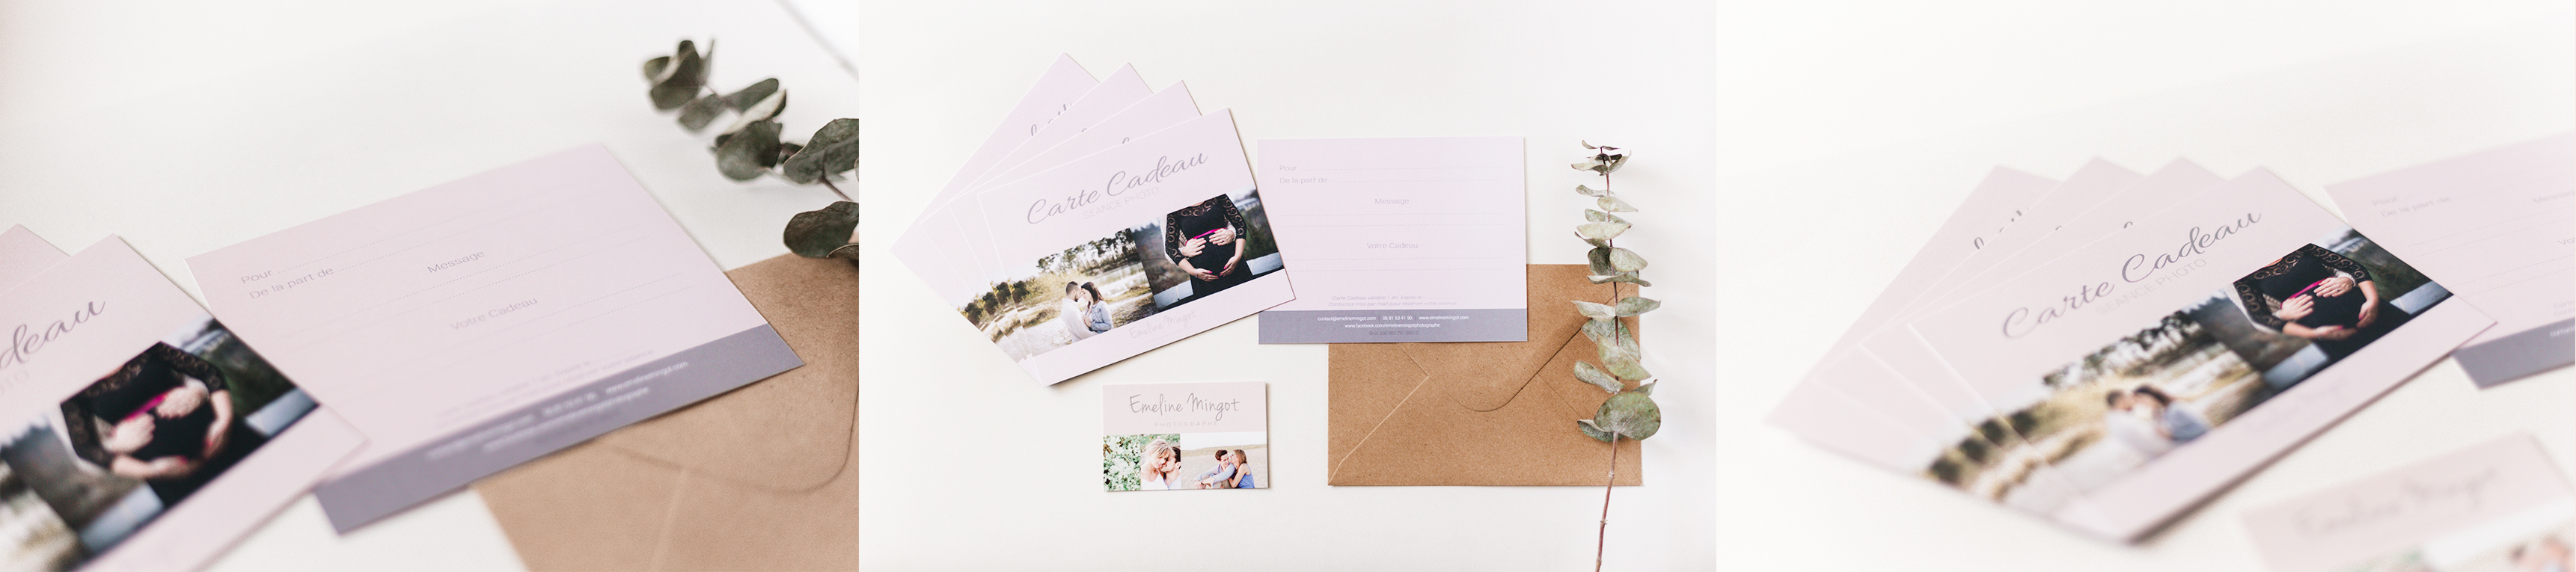 carte cadeau emeline mingot photographe